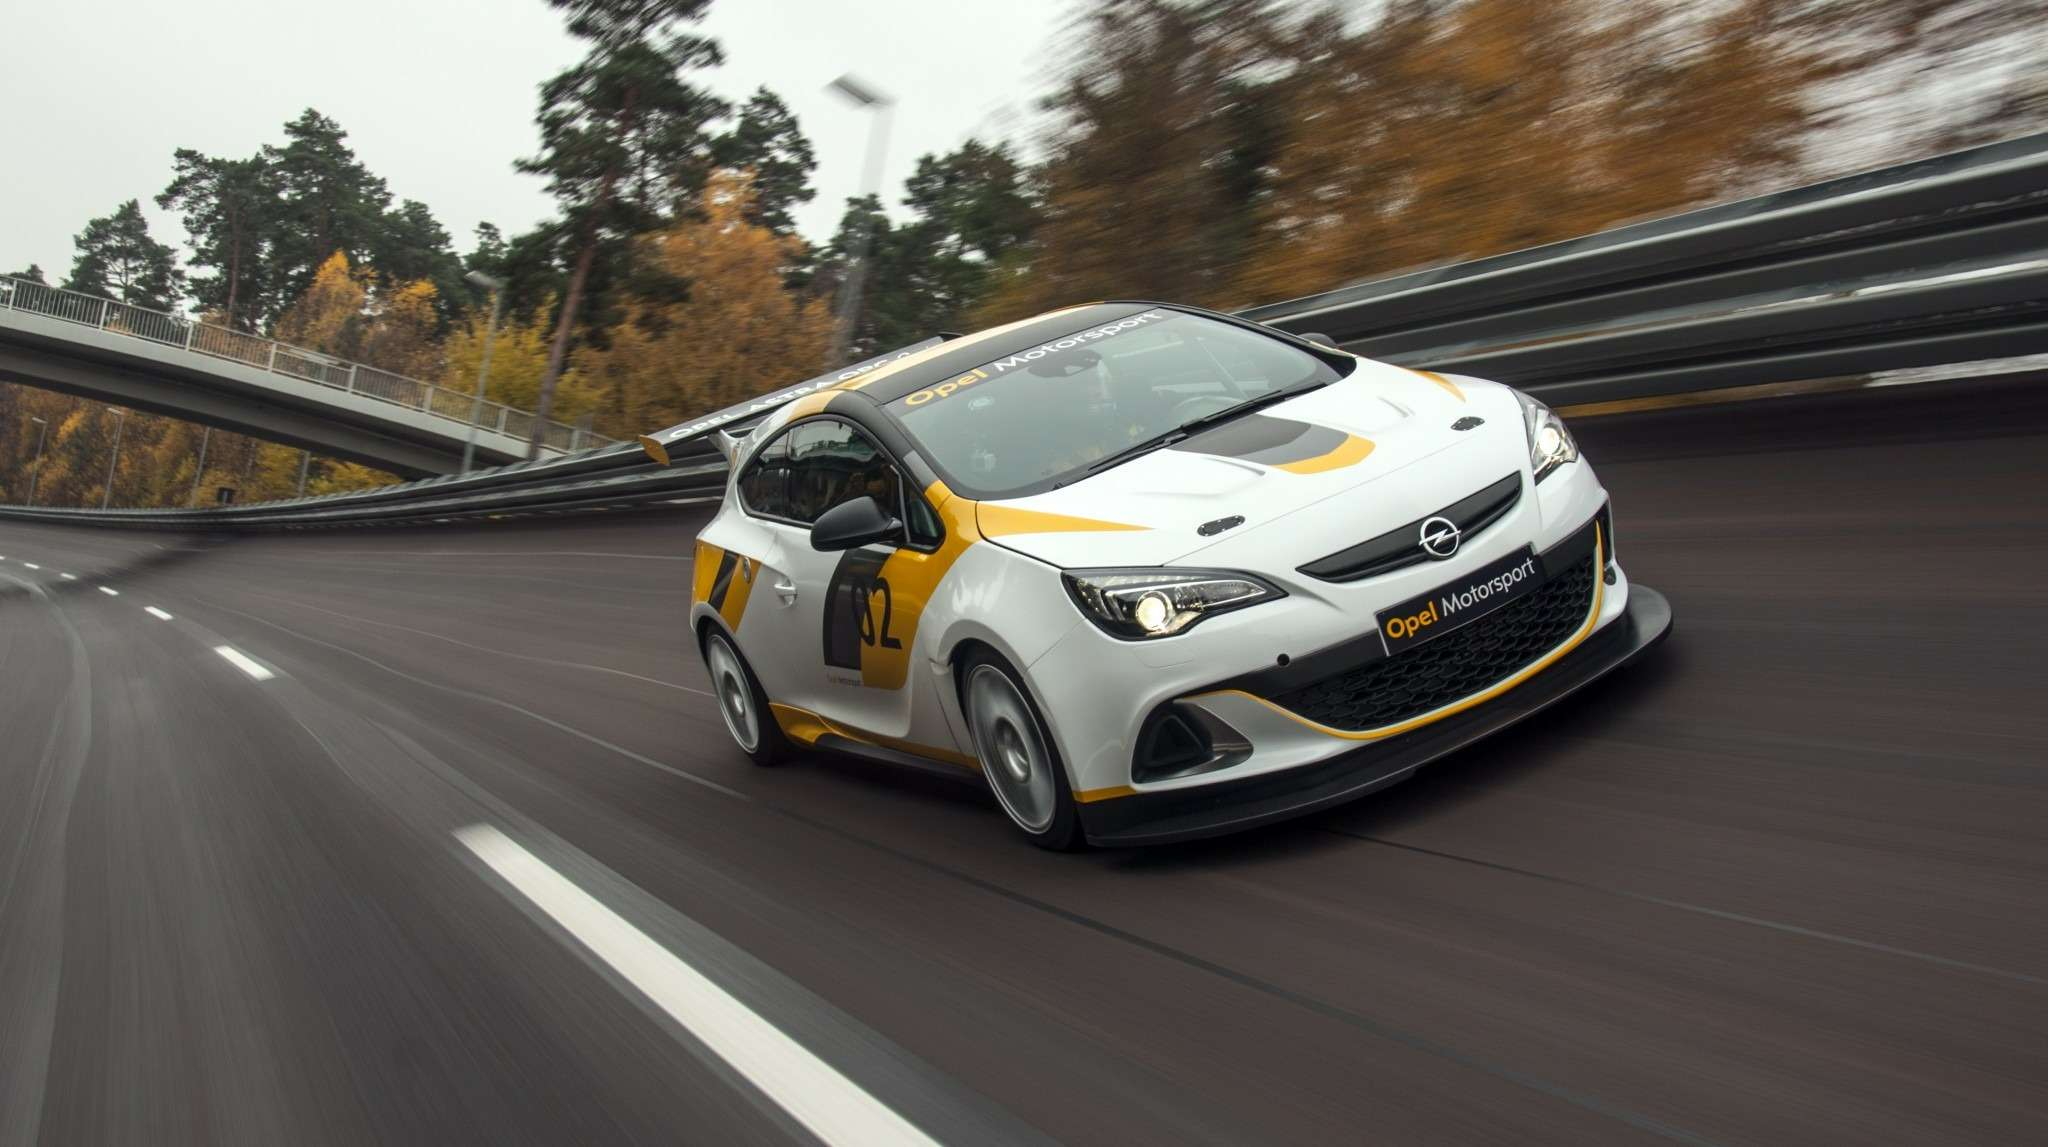 Opel-Astra-OPC_2_no_copyright